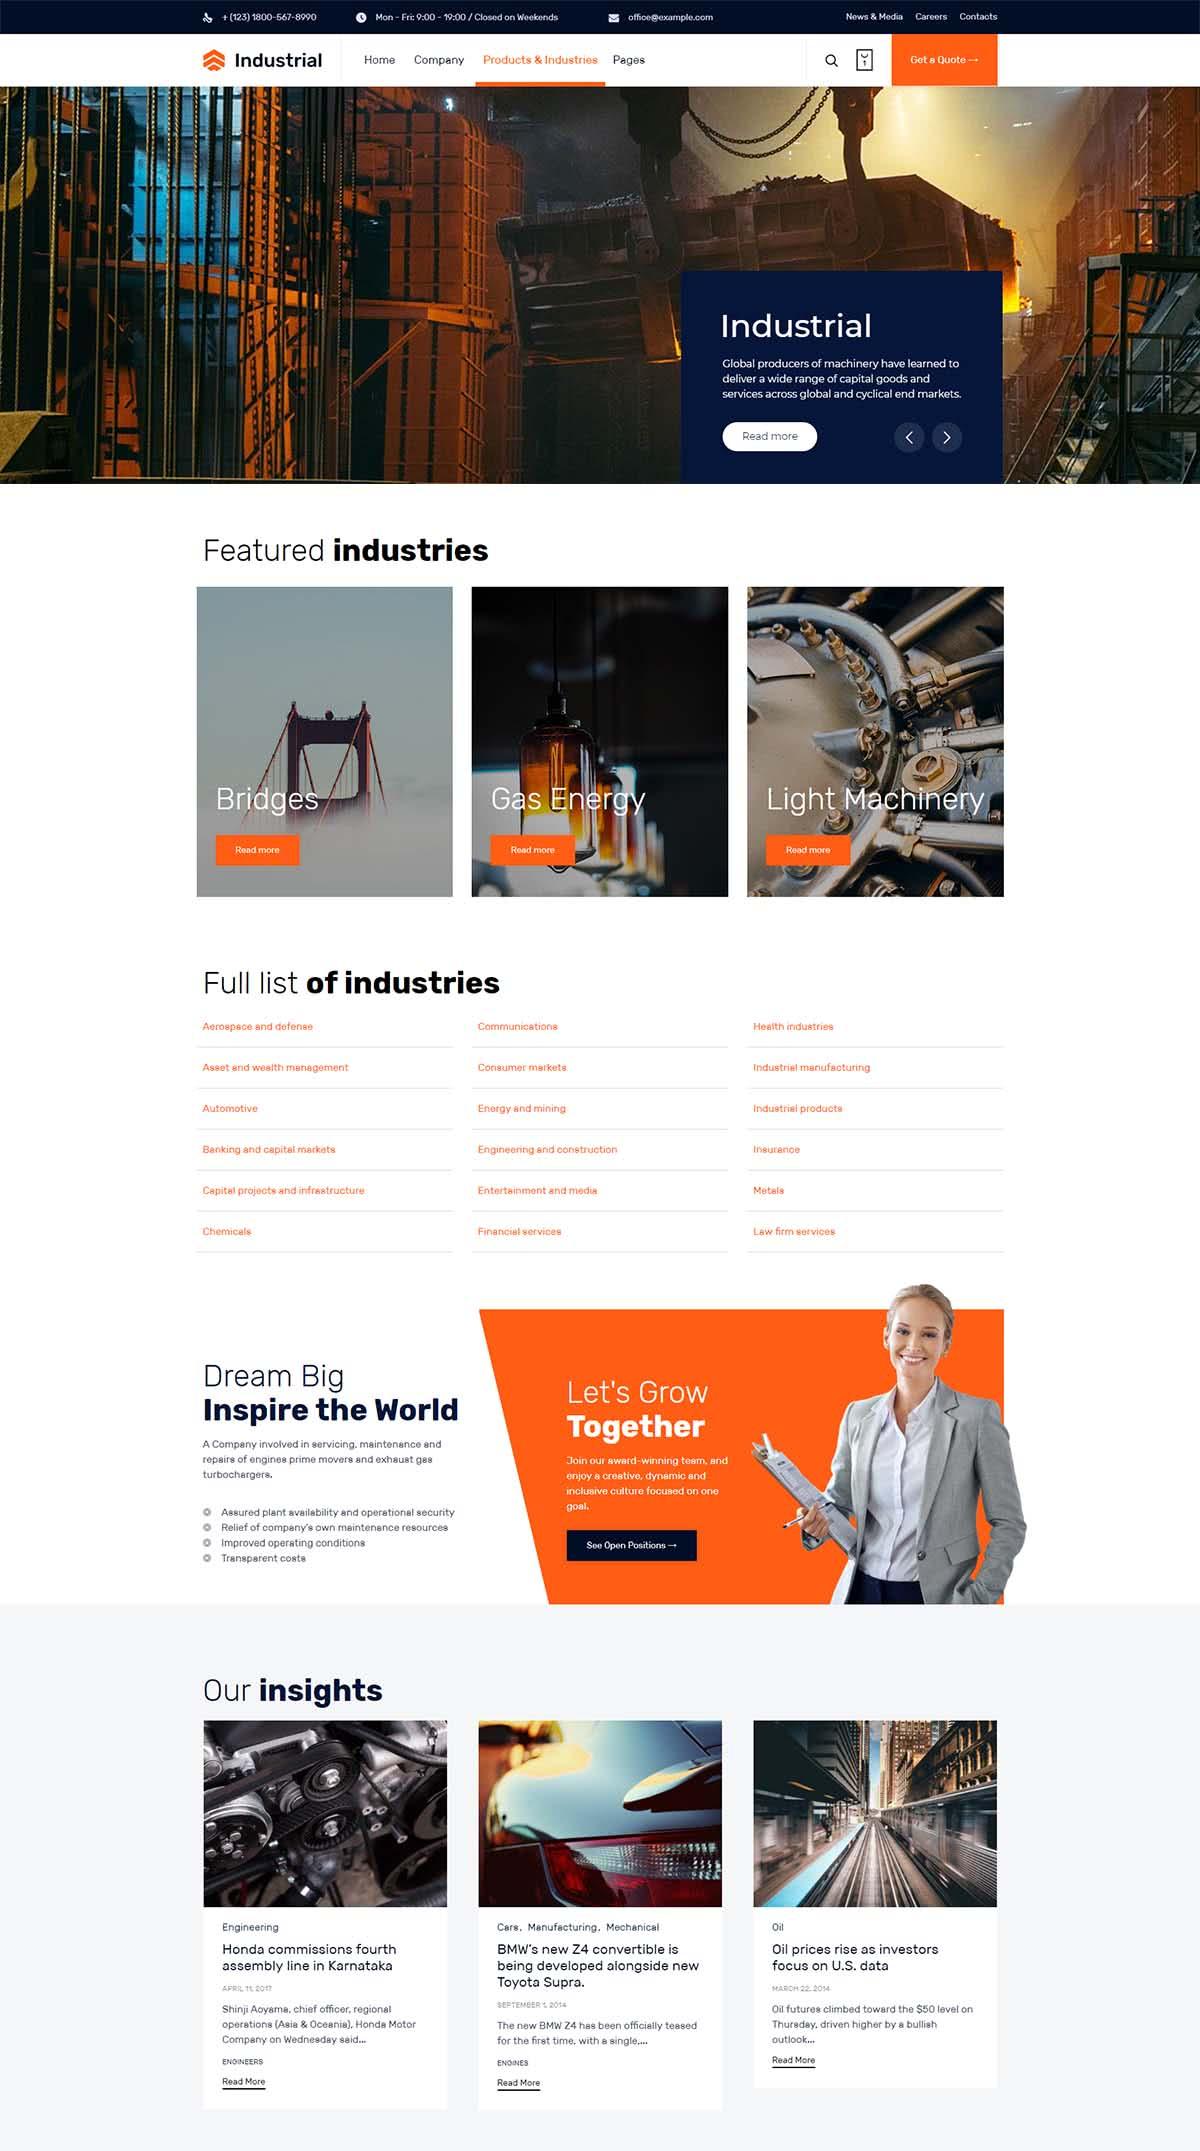 industries-served-1